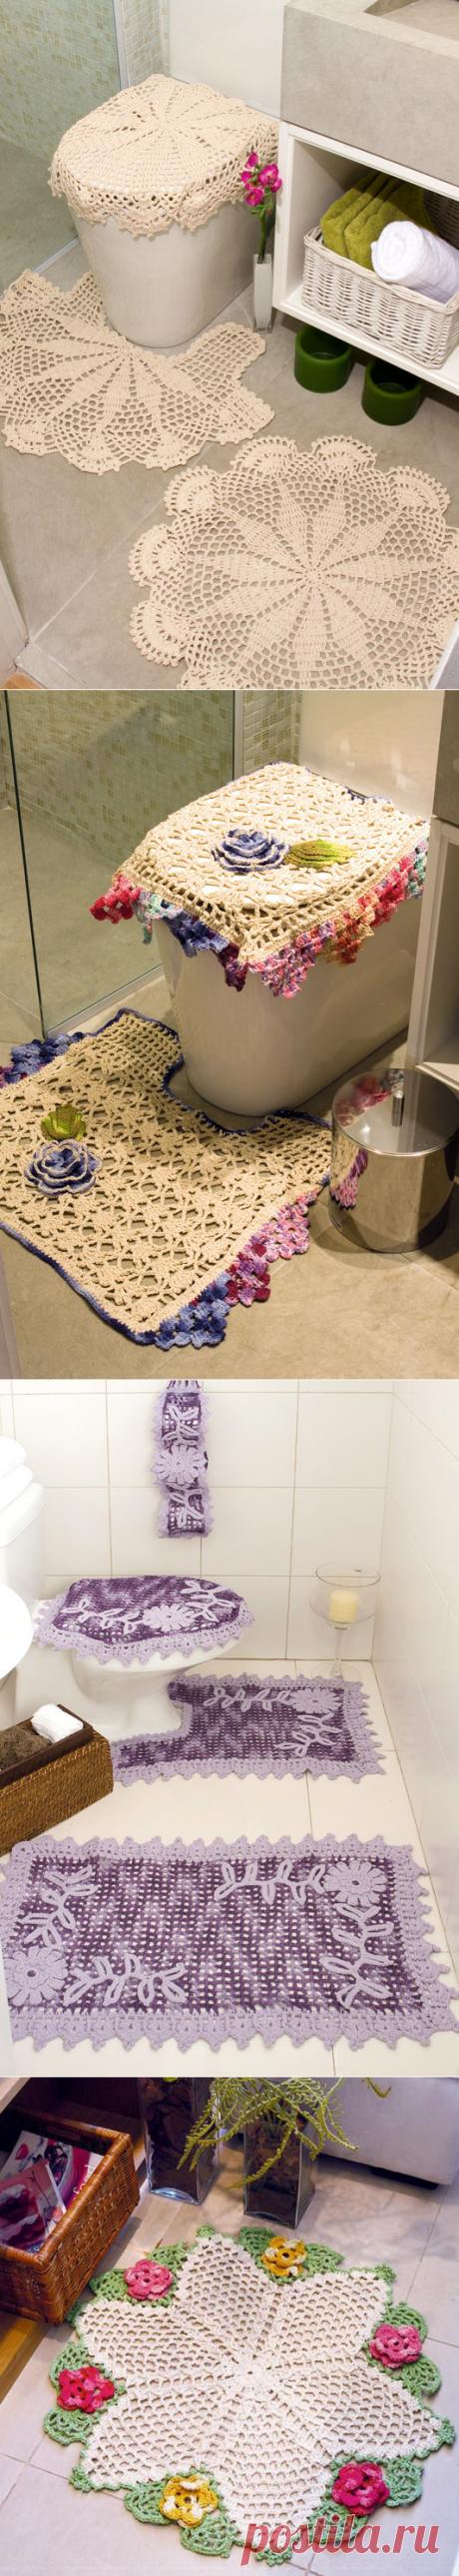 Комплект для ванной комнаты -крючком